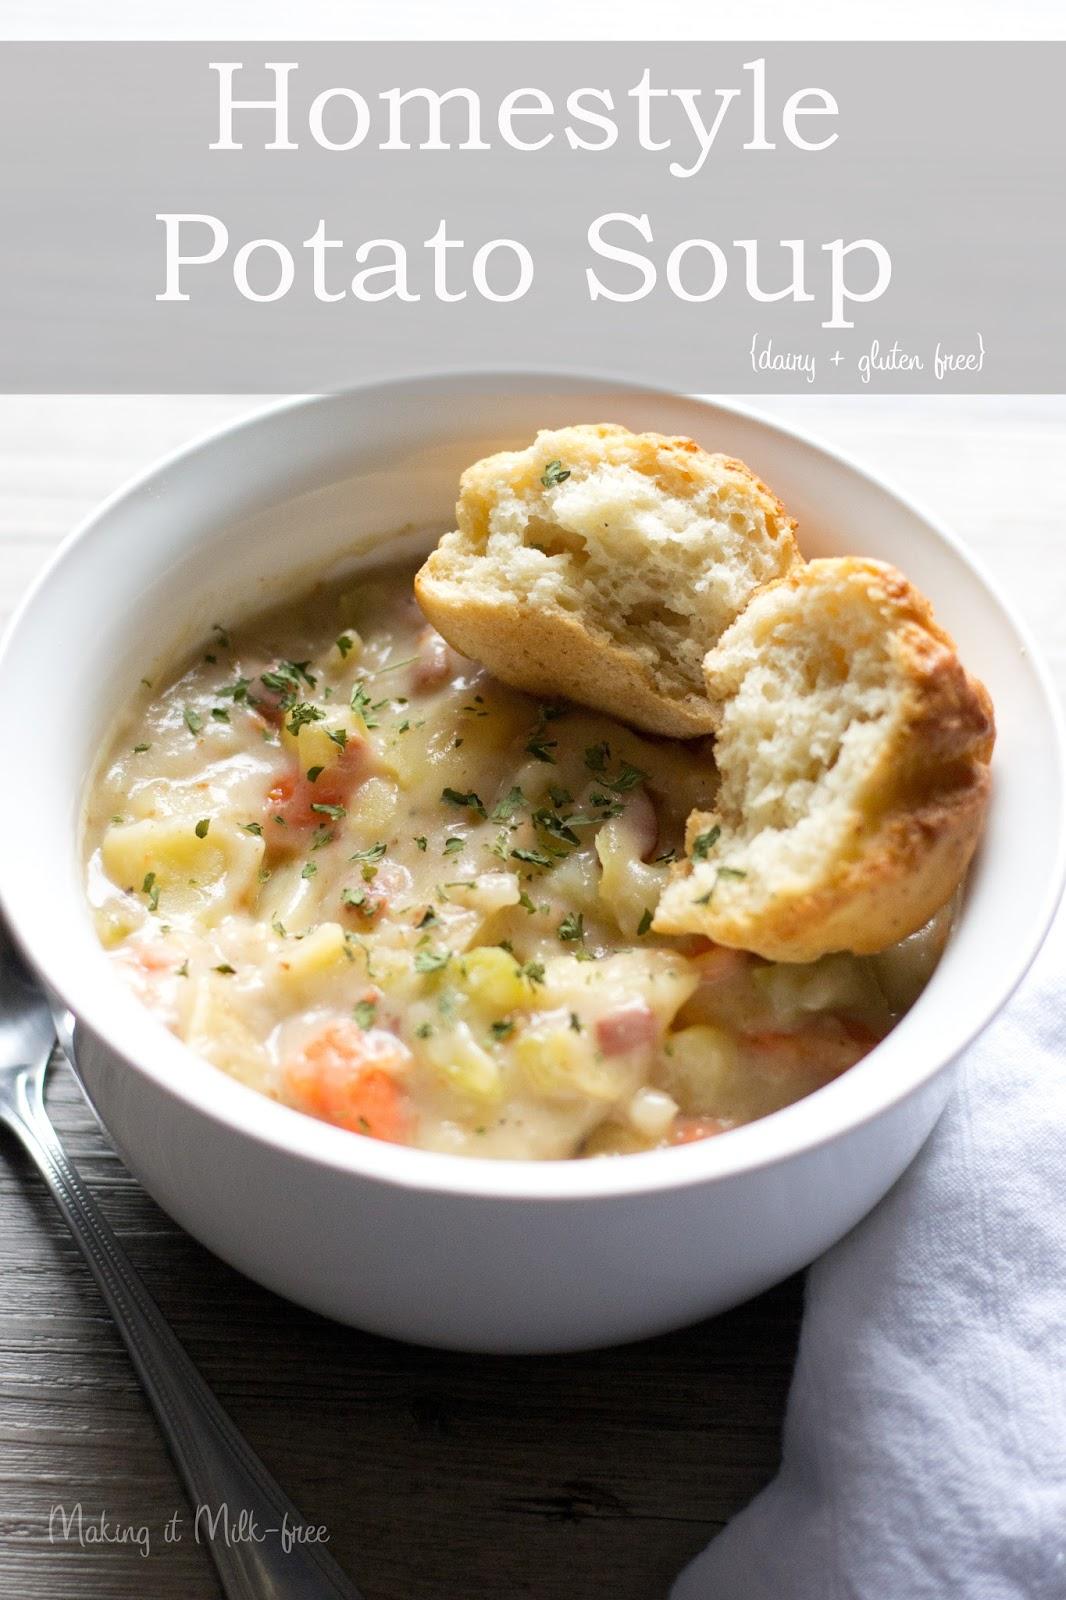 Homestyle Potato Soup {dairy + gluten free} by Making it Milk-free